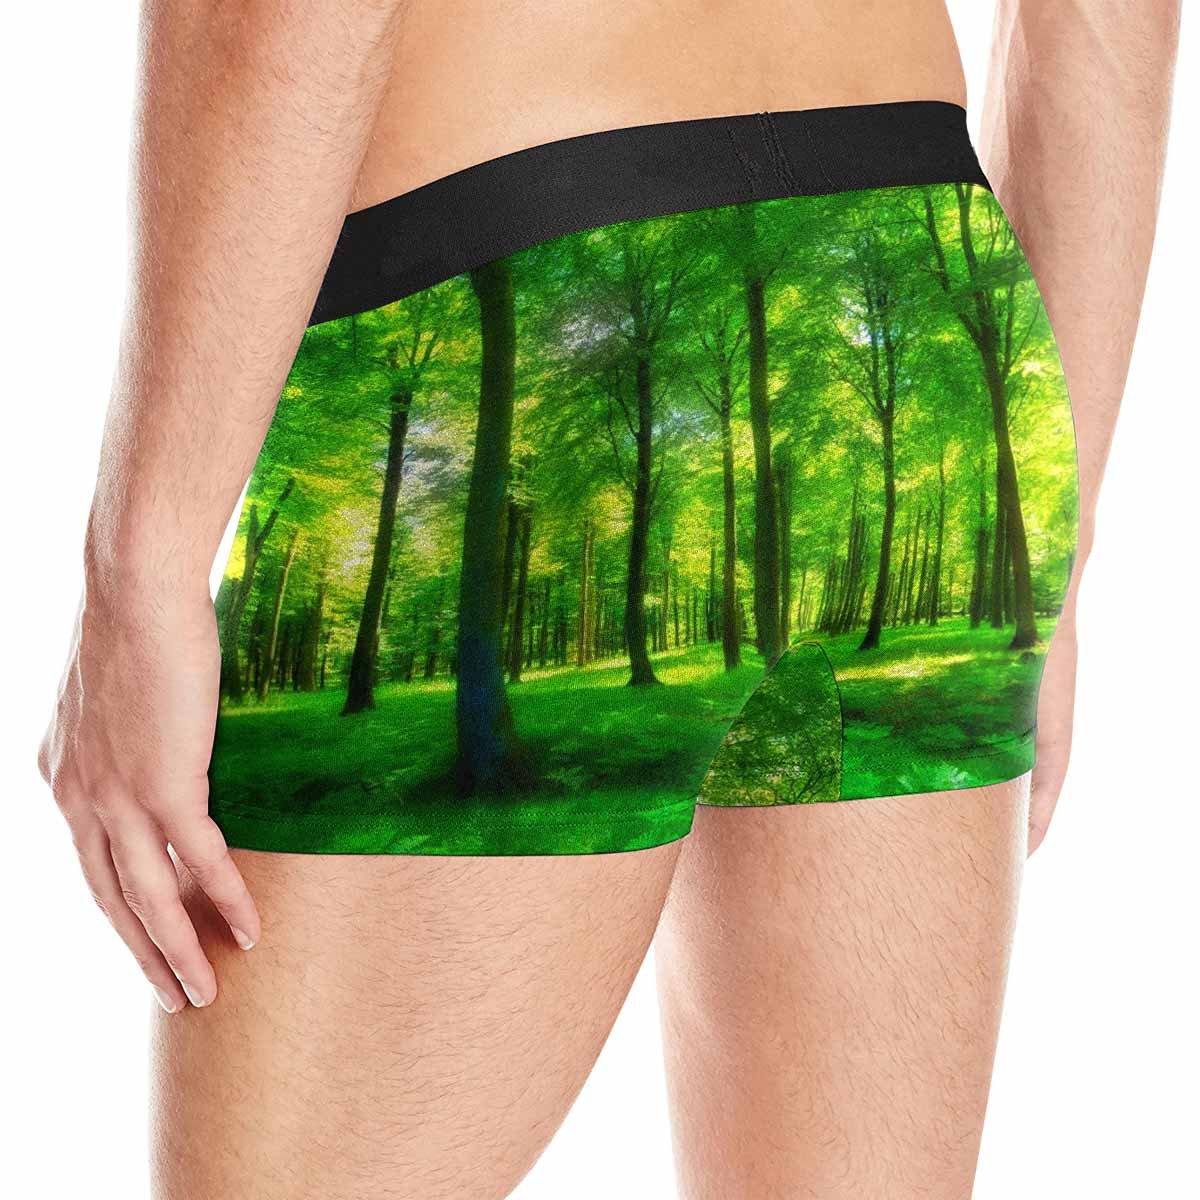 INTERESTPRINT Mens Boxer Briefs Underwear Sunlight in A Green and Lush Forest XS-3XL